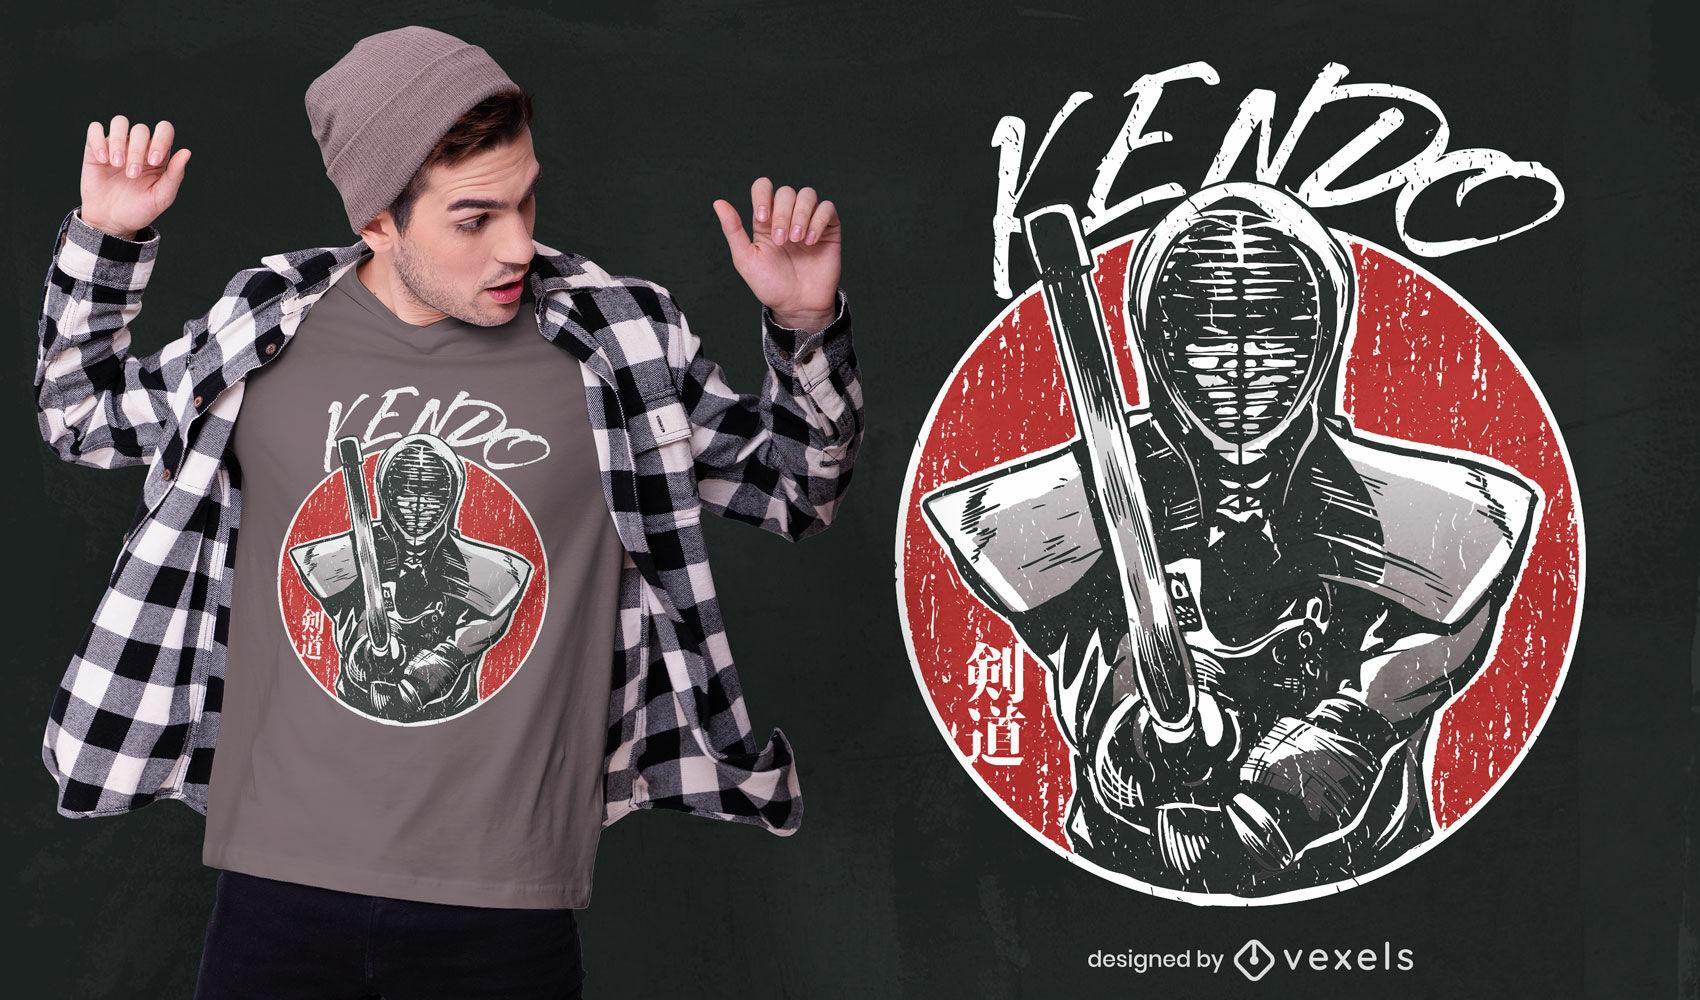 Diseño de camiseta con textura de luchador de kendo